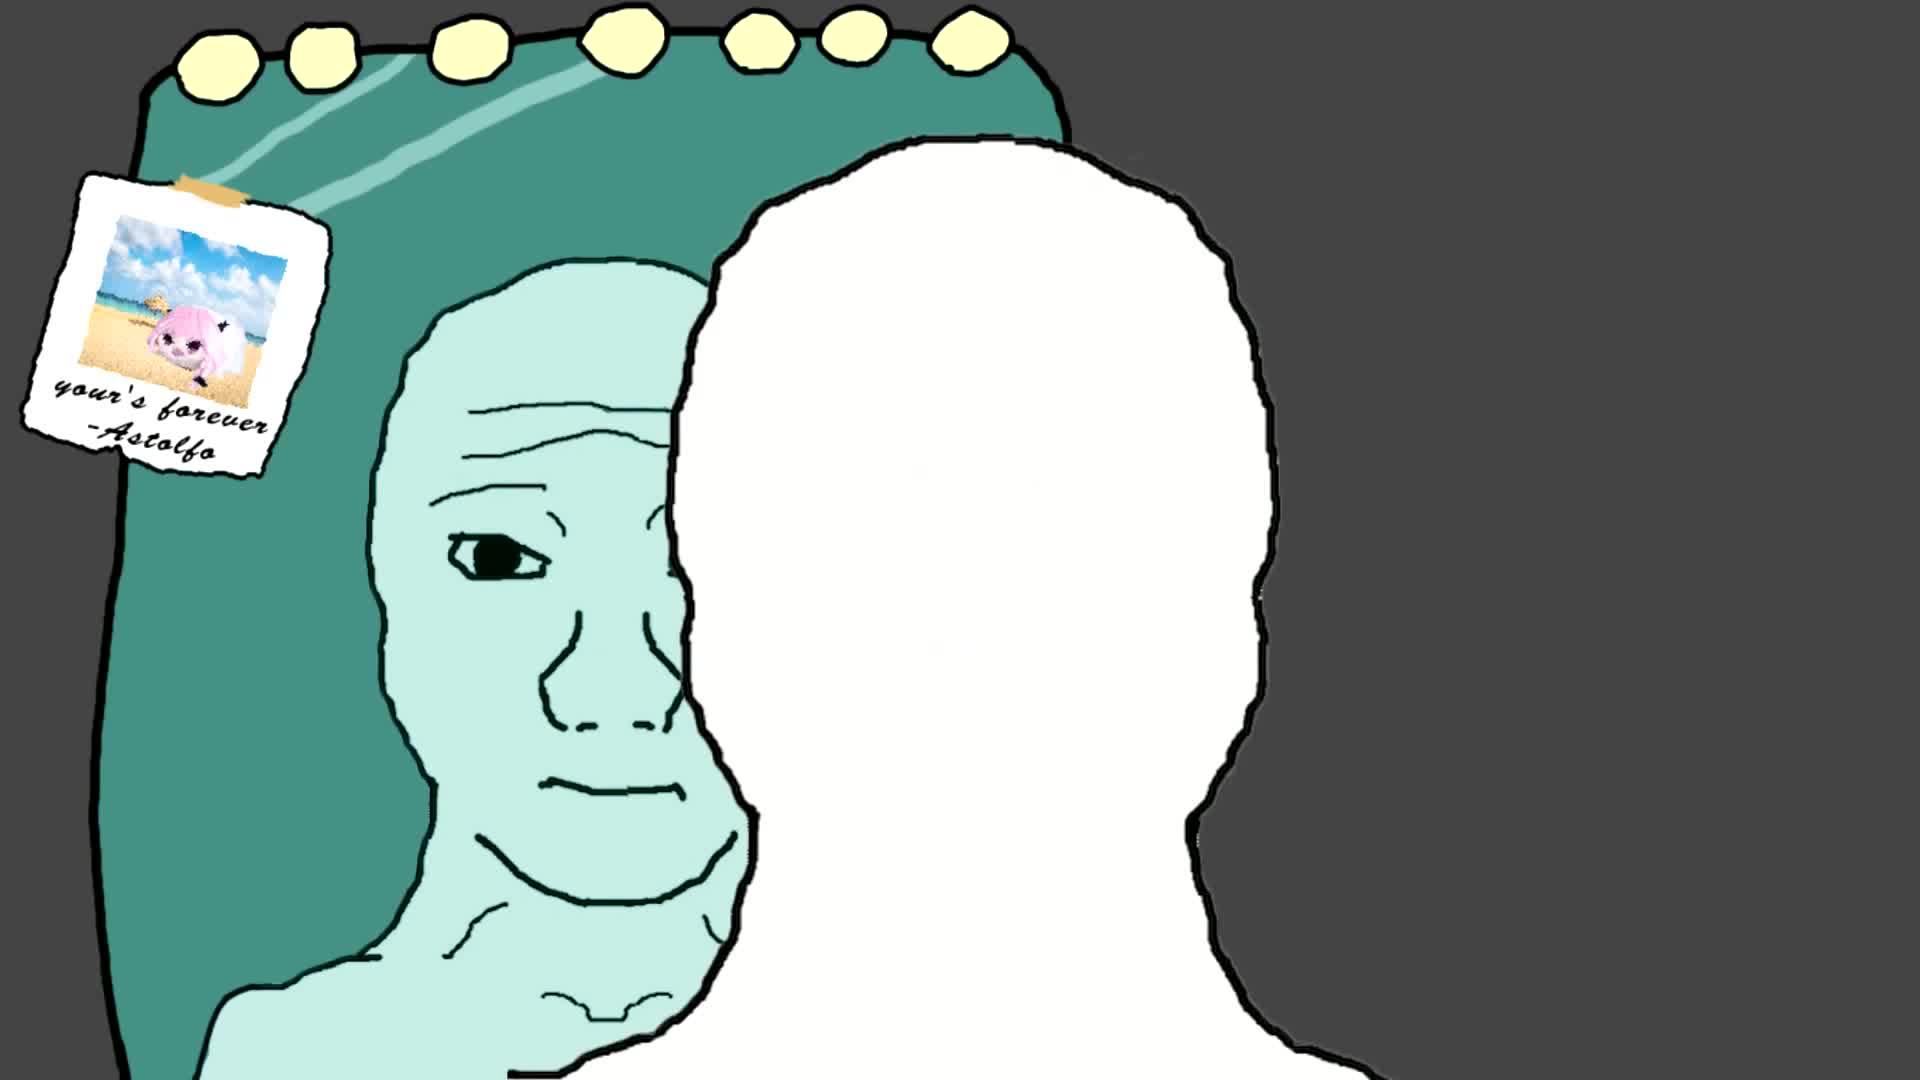 /pol/, /v/, 30 year old boomer, 4chan, alex jones, biz, boomer, feels guy, greentext, grug, info wars, meme, memes, murdoch murdoch, pepe, pepe the frog, pol, tfw, wojack, wojak, tfw 25 year old boomer GIFs